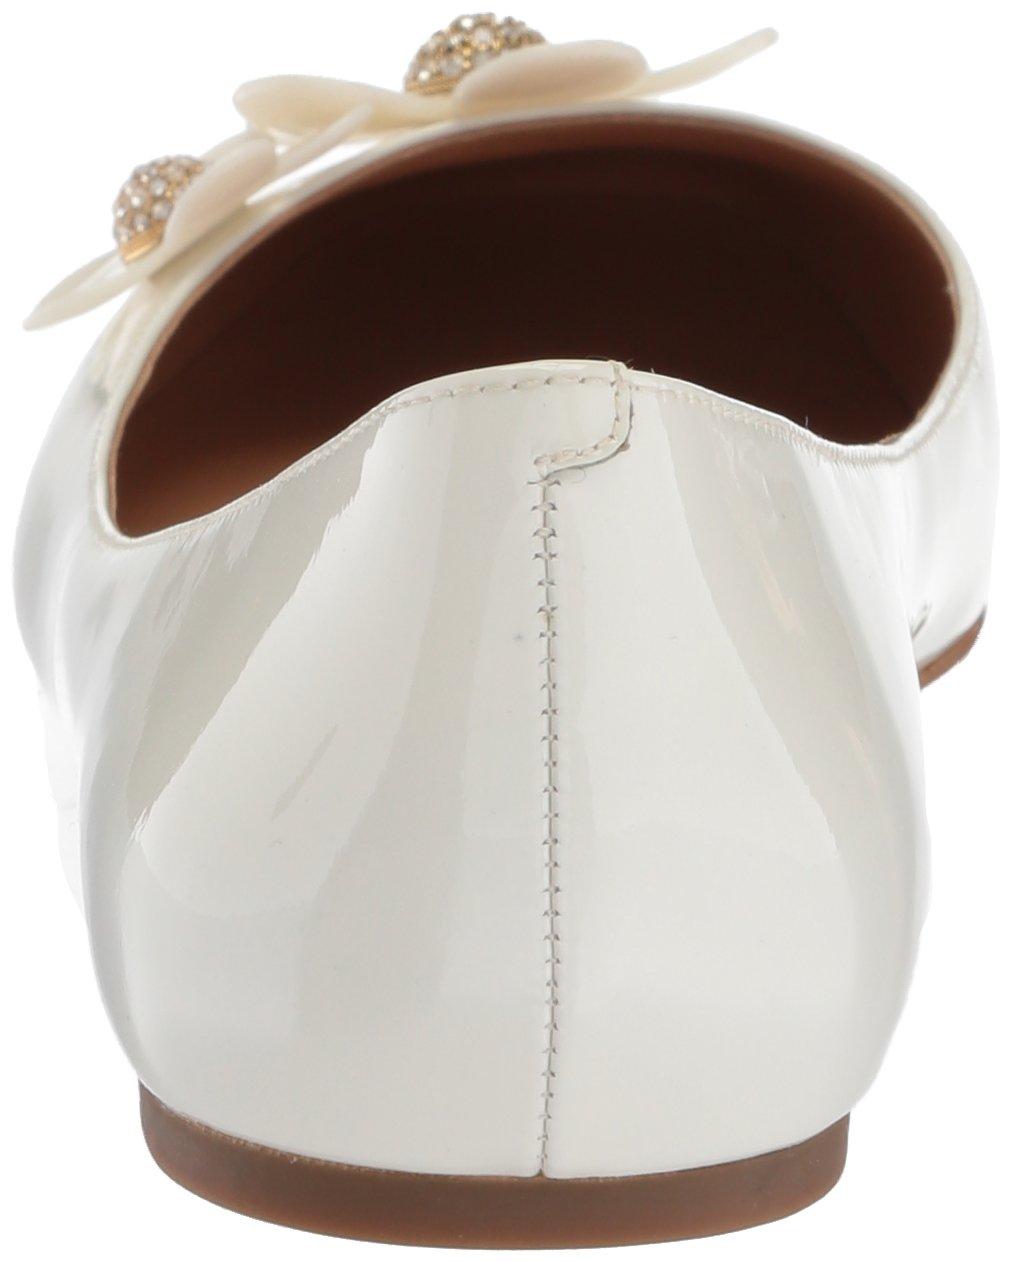 Marc Jacobs Women's Daisy Ballerina Ballet Flat B075Y6T8GJ 40 M EU (10 US)|White